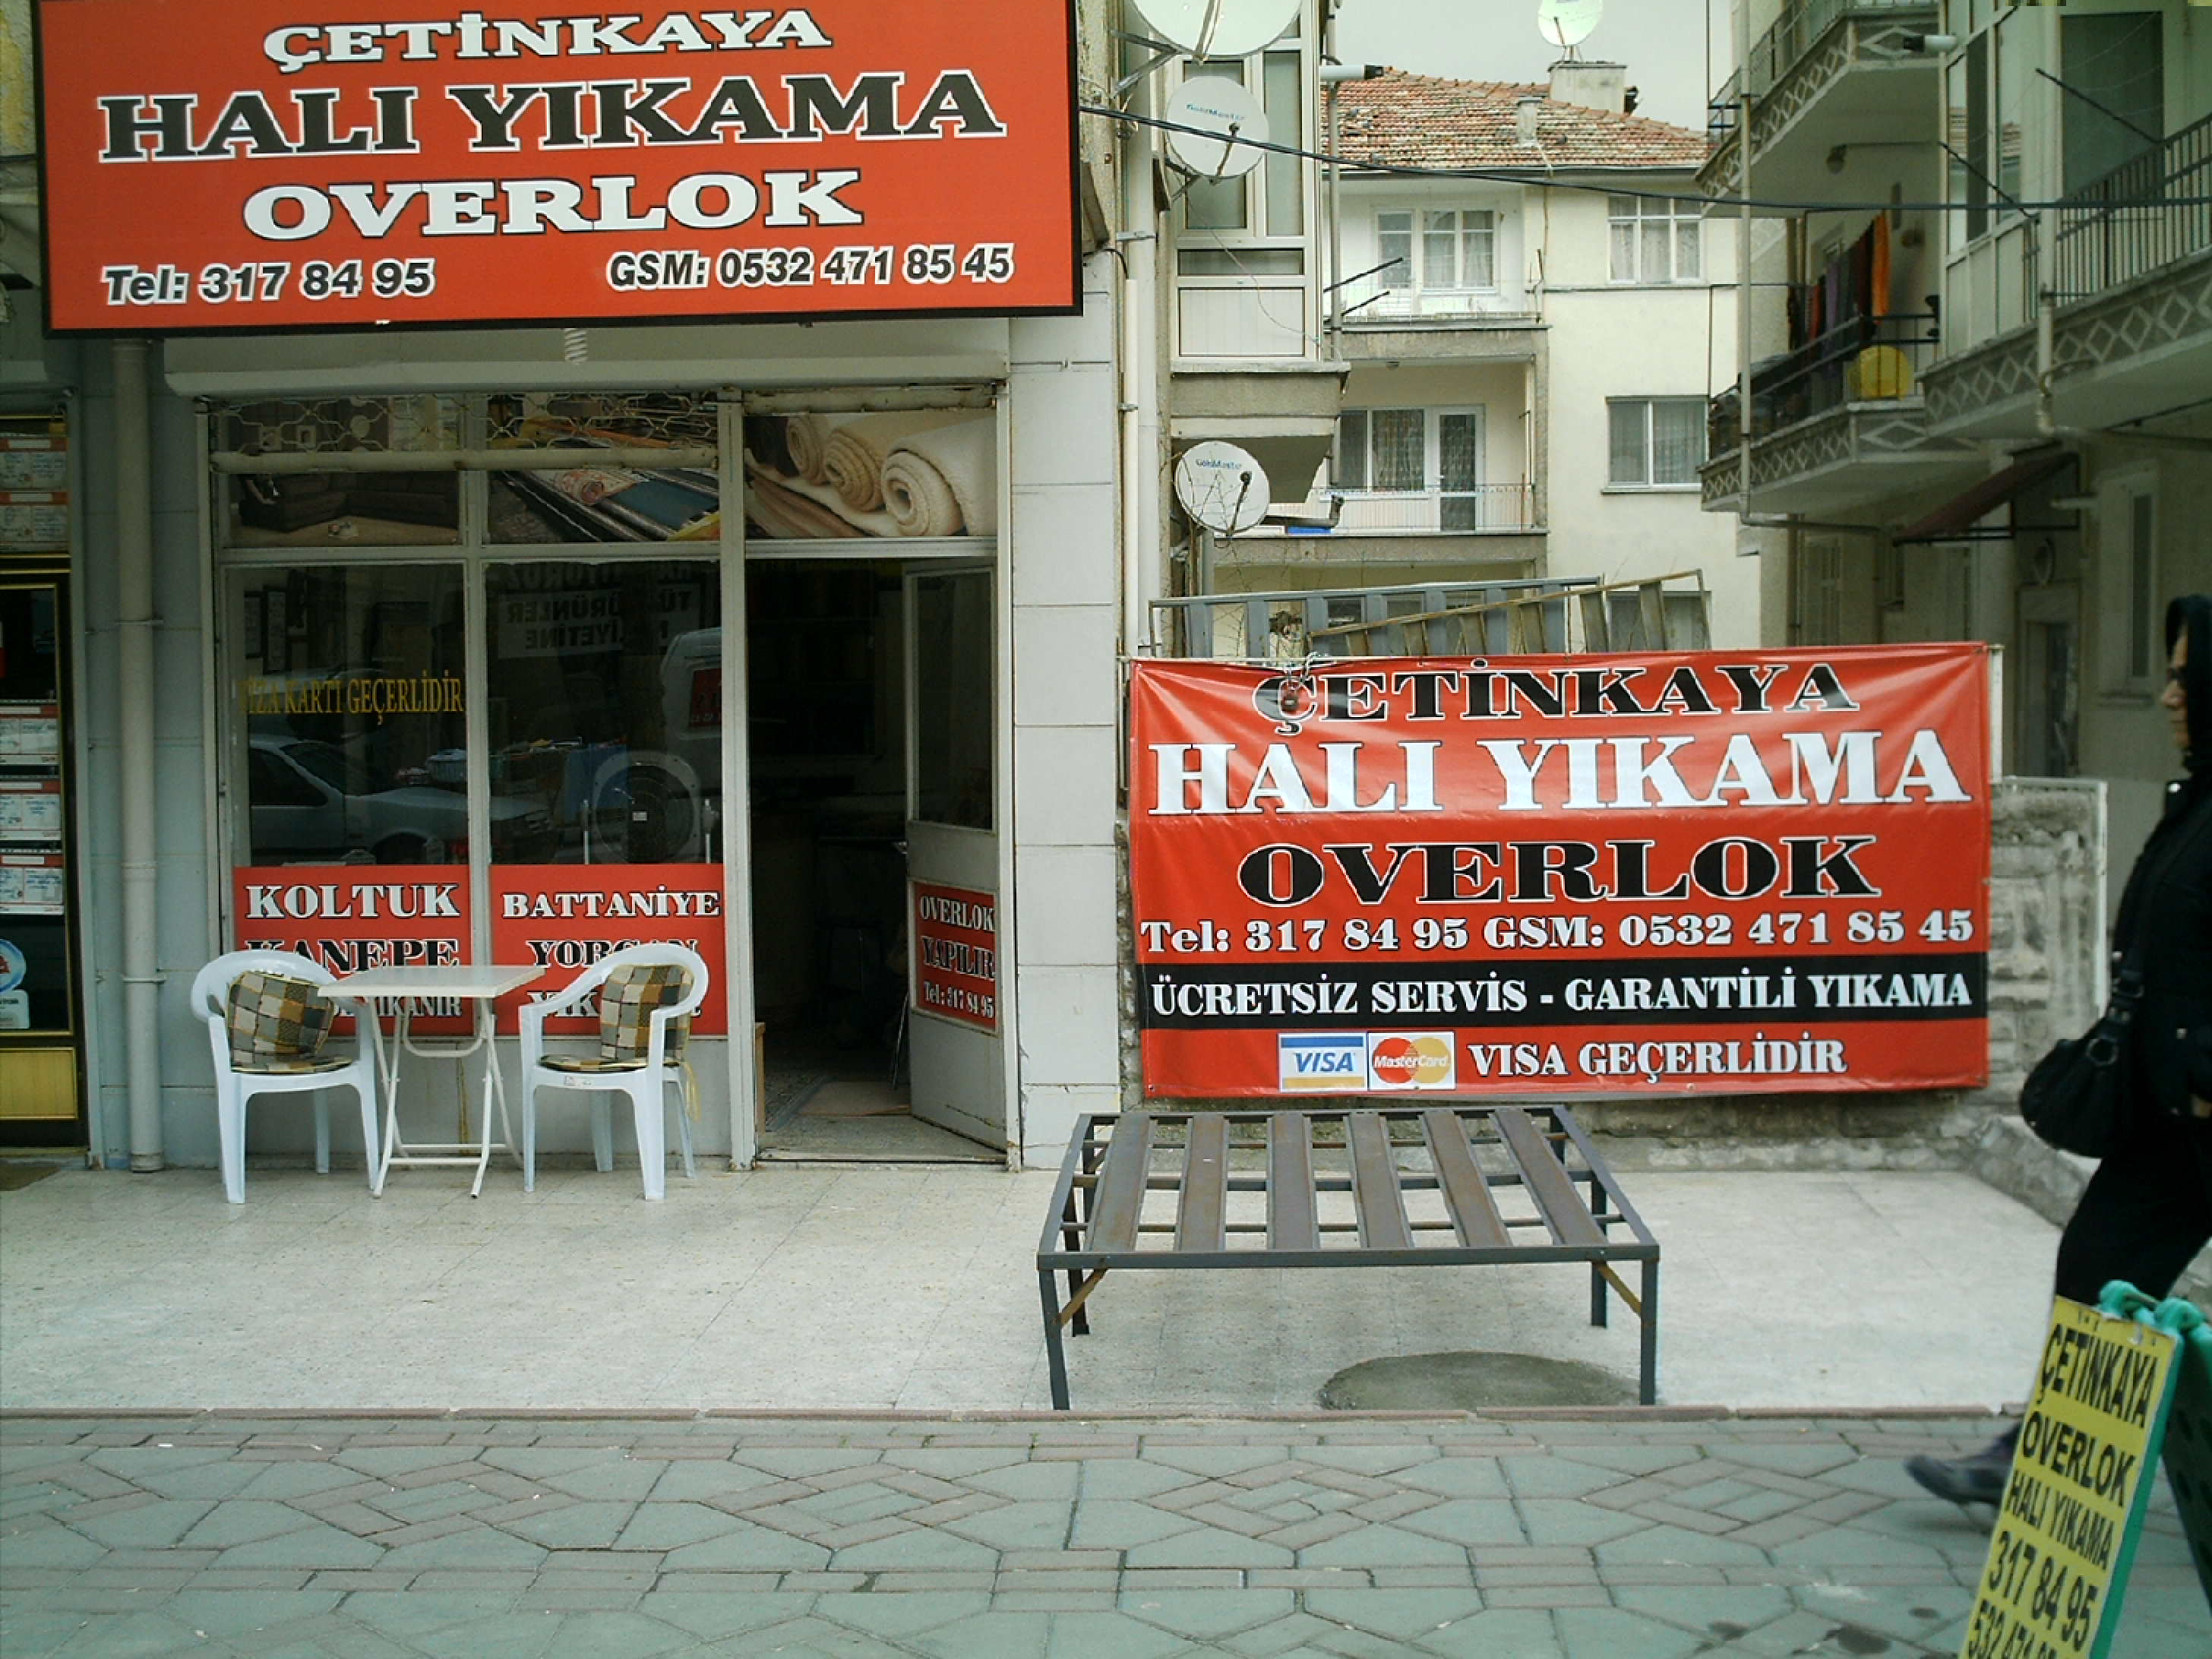 varlık_hali_yikama